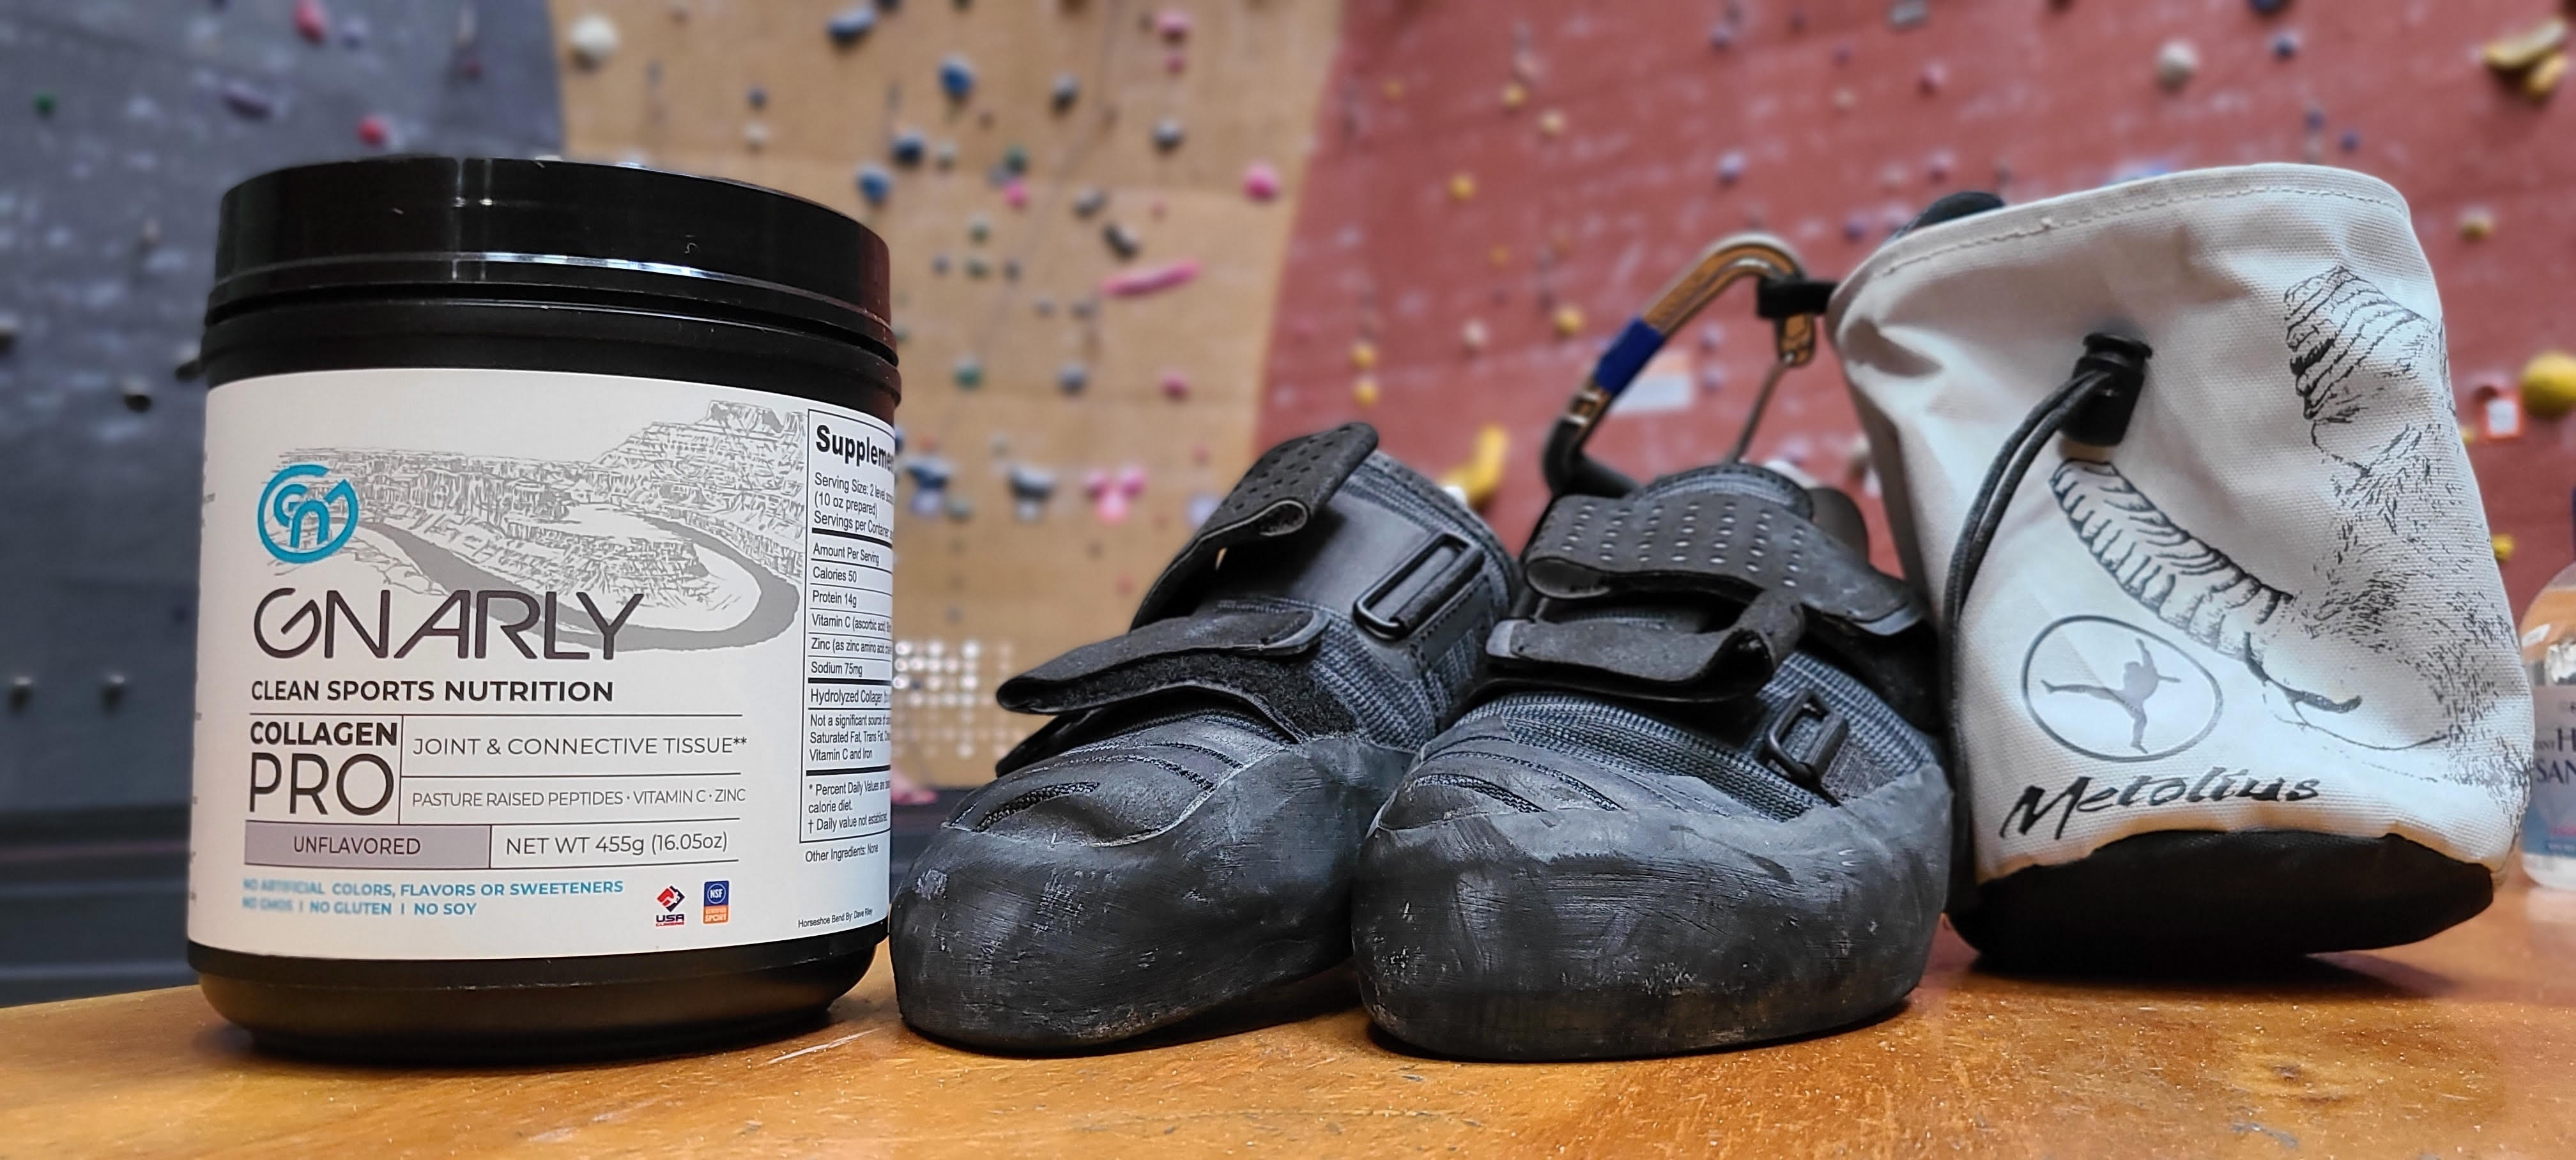 gnarly-nutrition-collagen-pro-review-dirtbagdreams.com